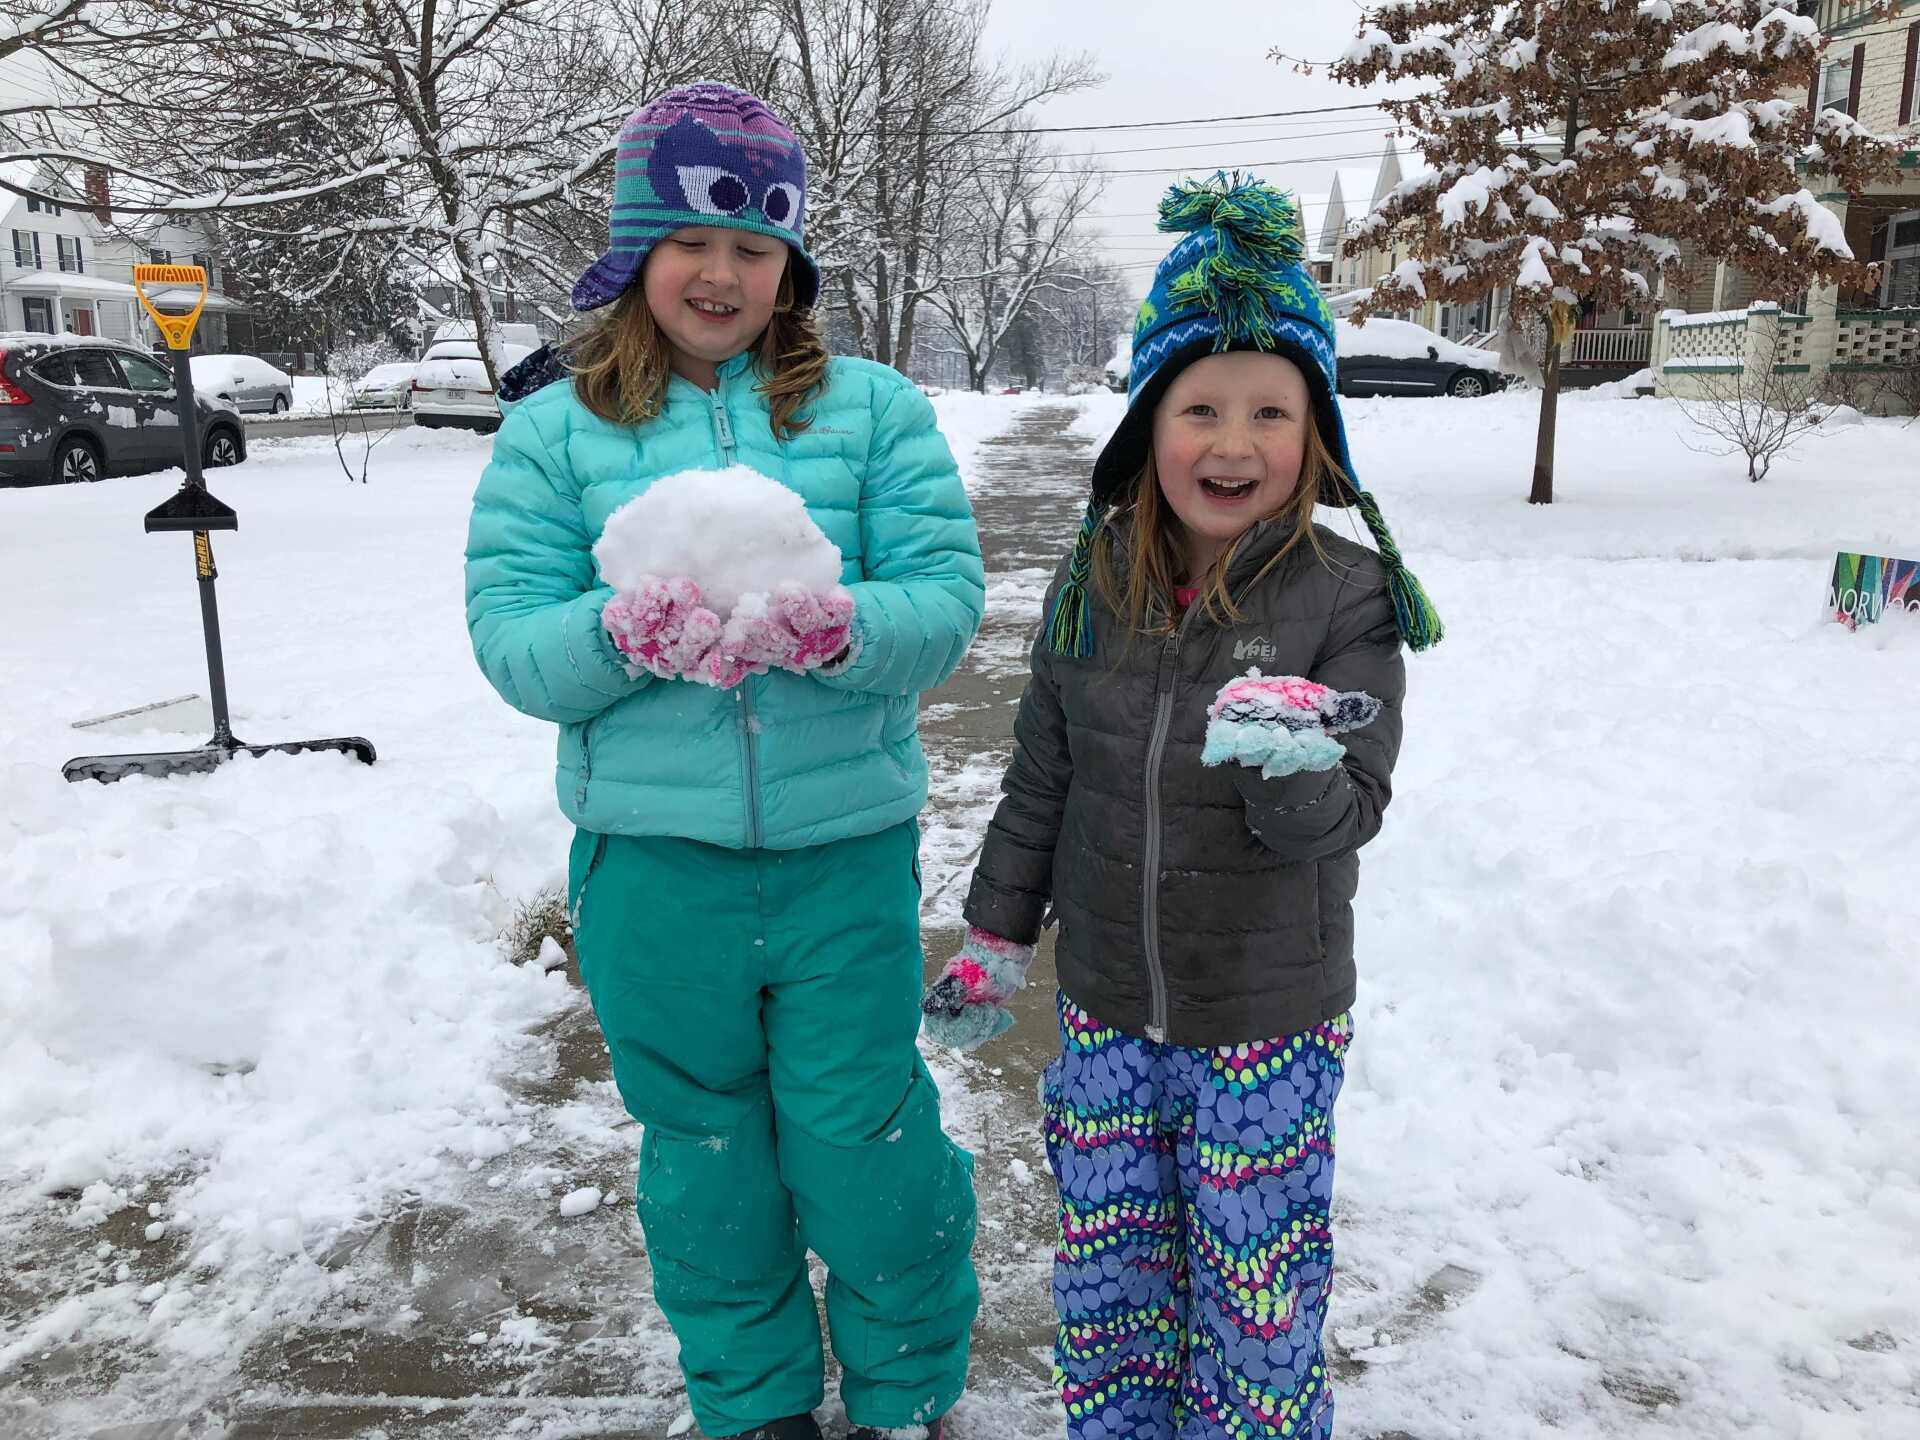 WCPO snow maggie and rosie thorp norwood.jpg